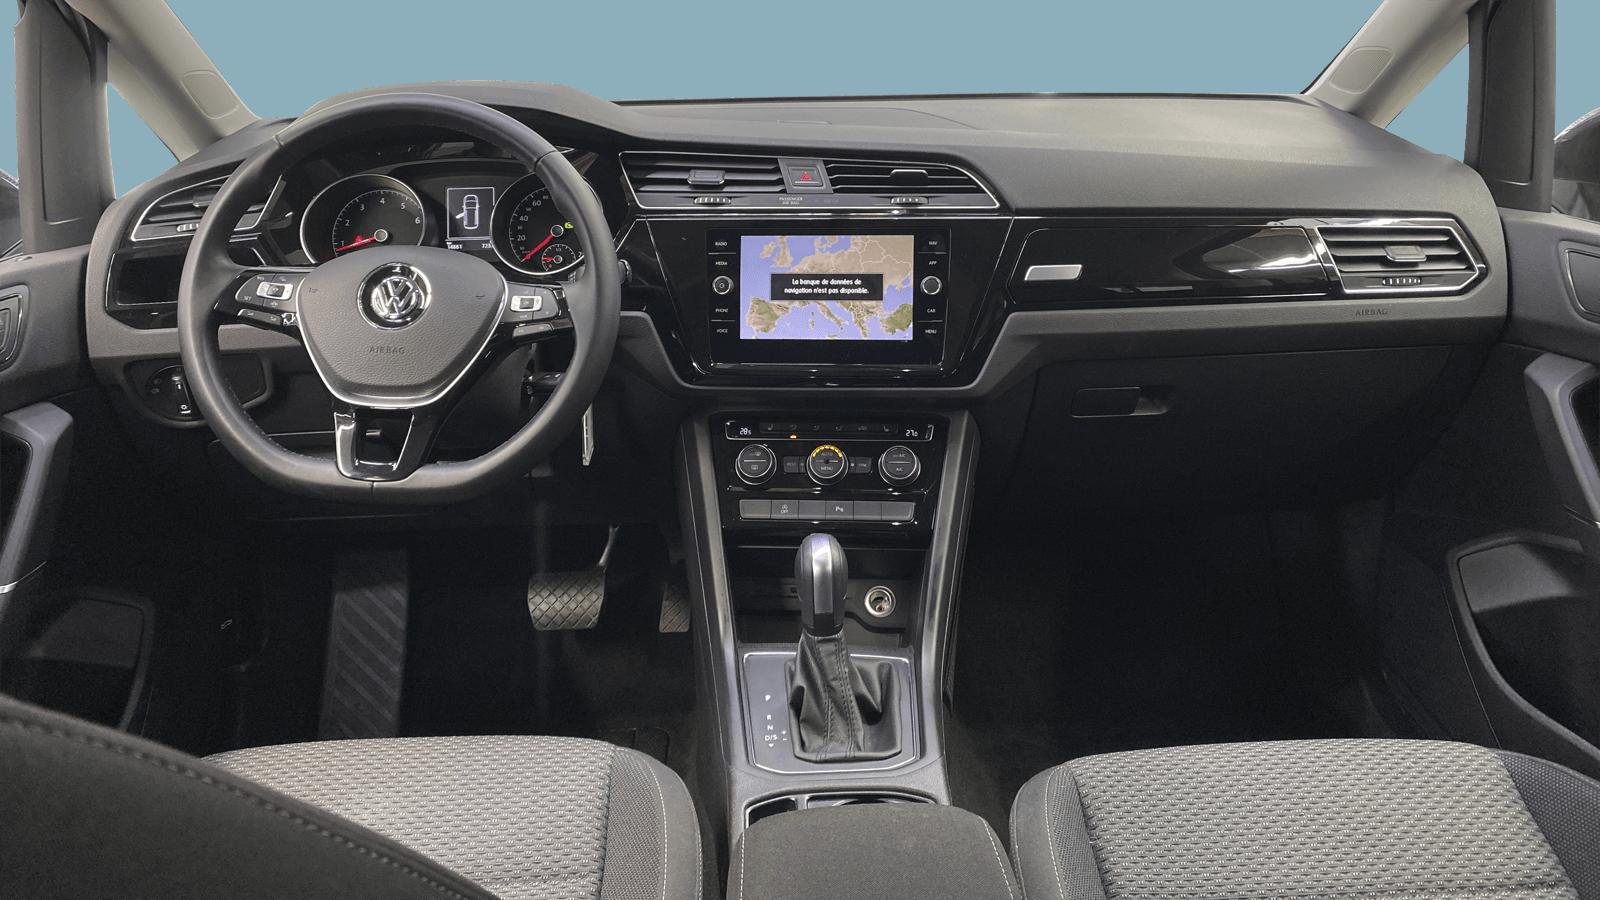 VW Touran Grau interior - Clyde Auto-Abo